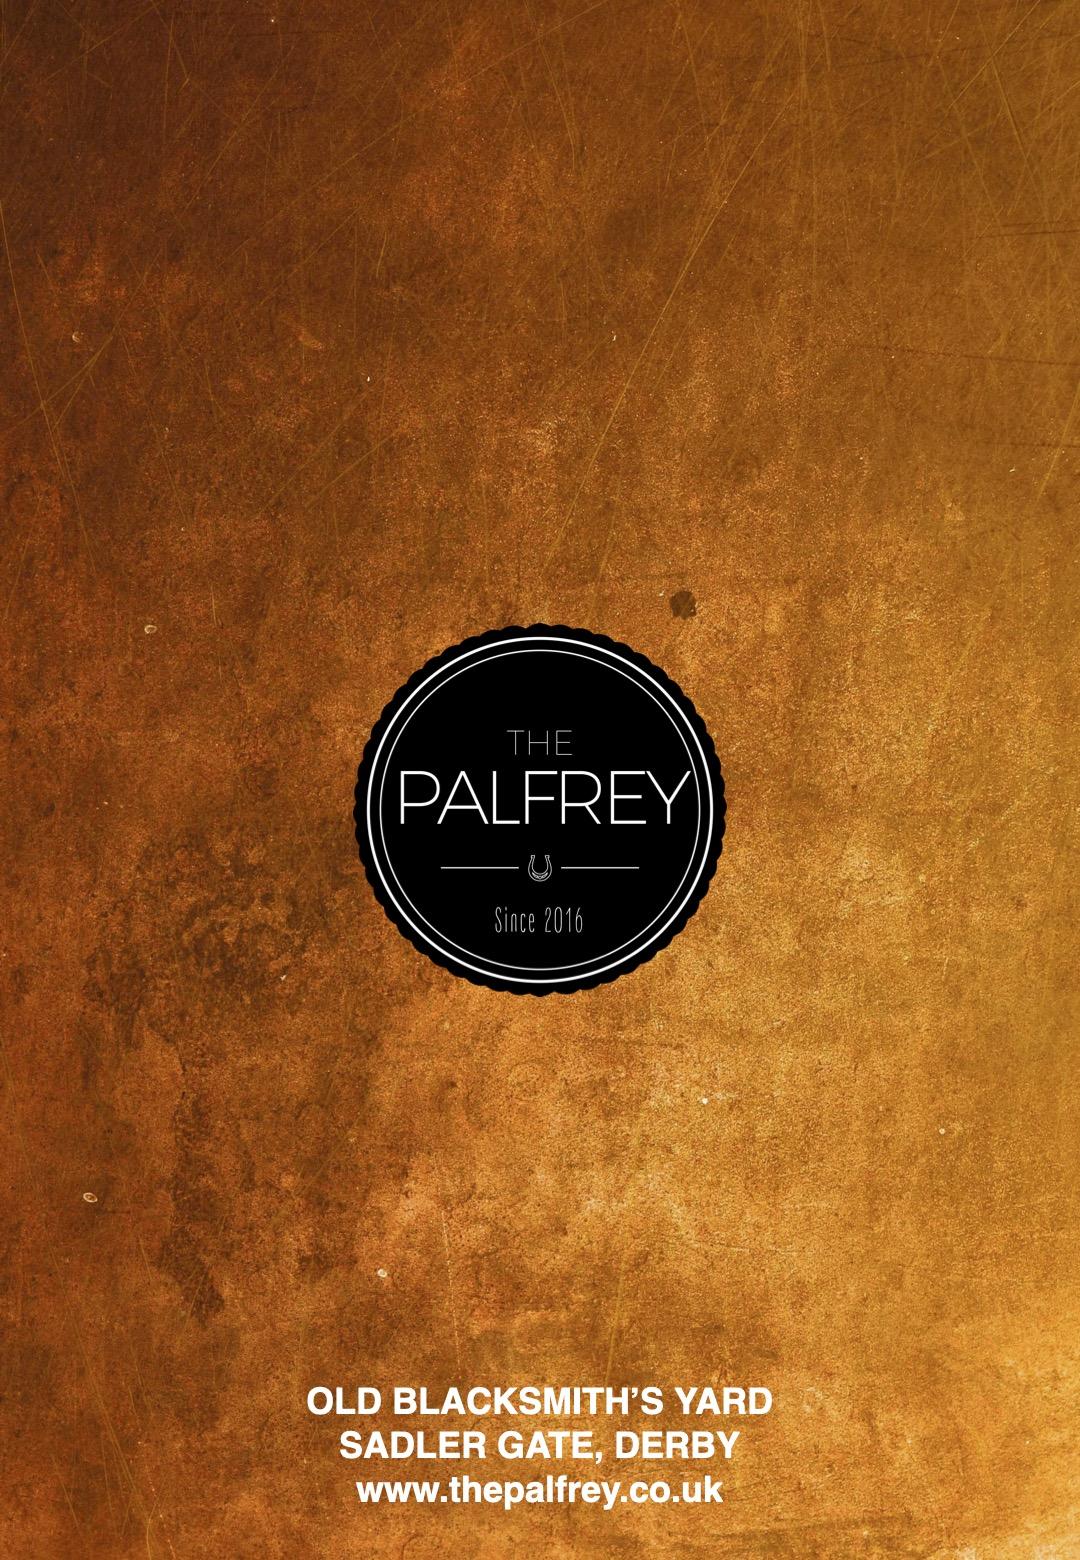 palfrey-casual-dining-menu-3